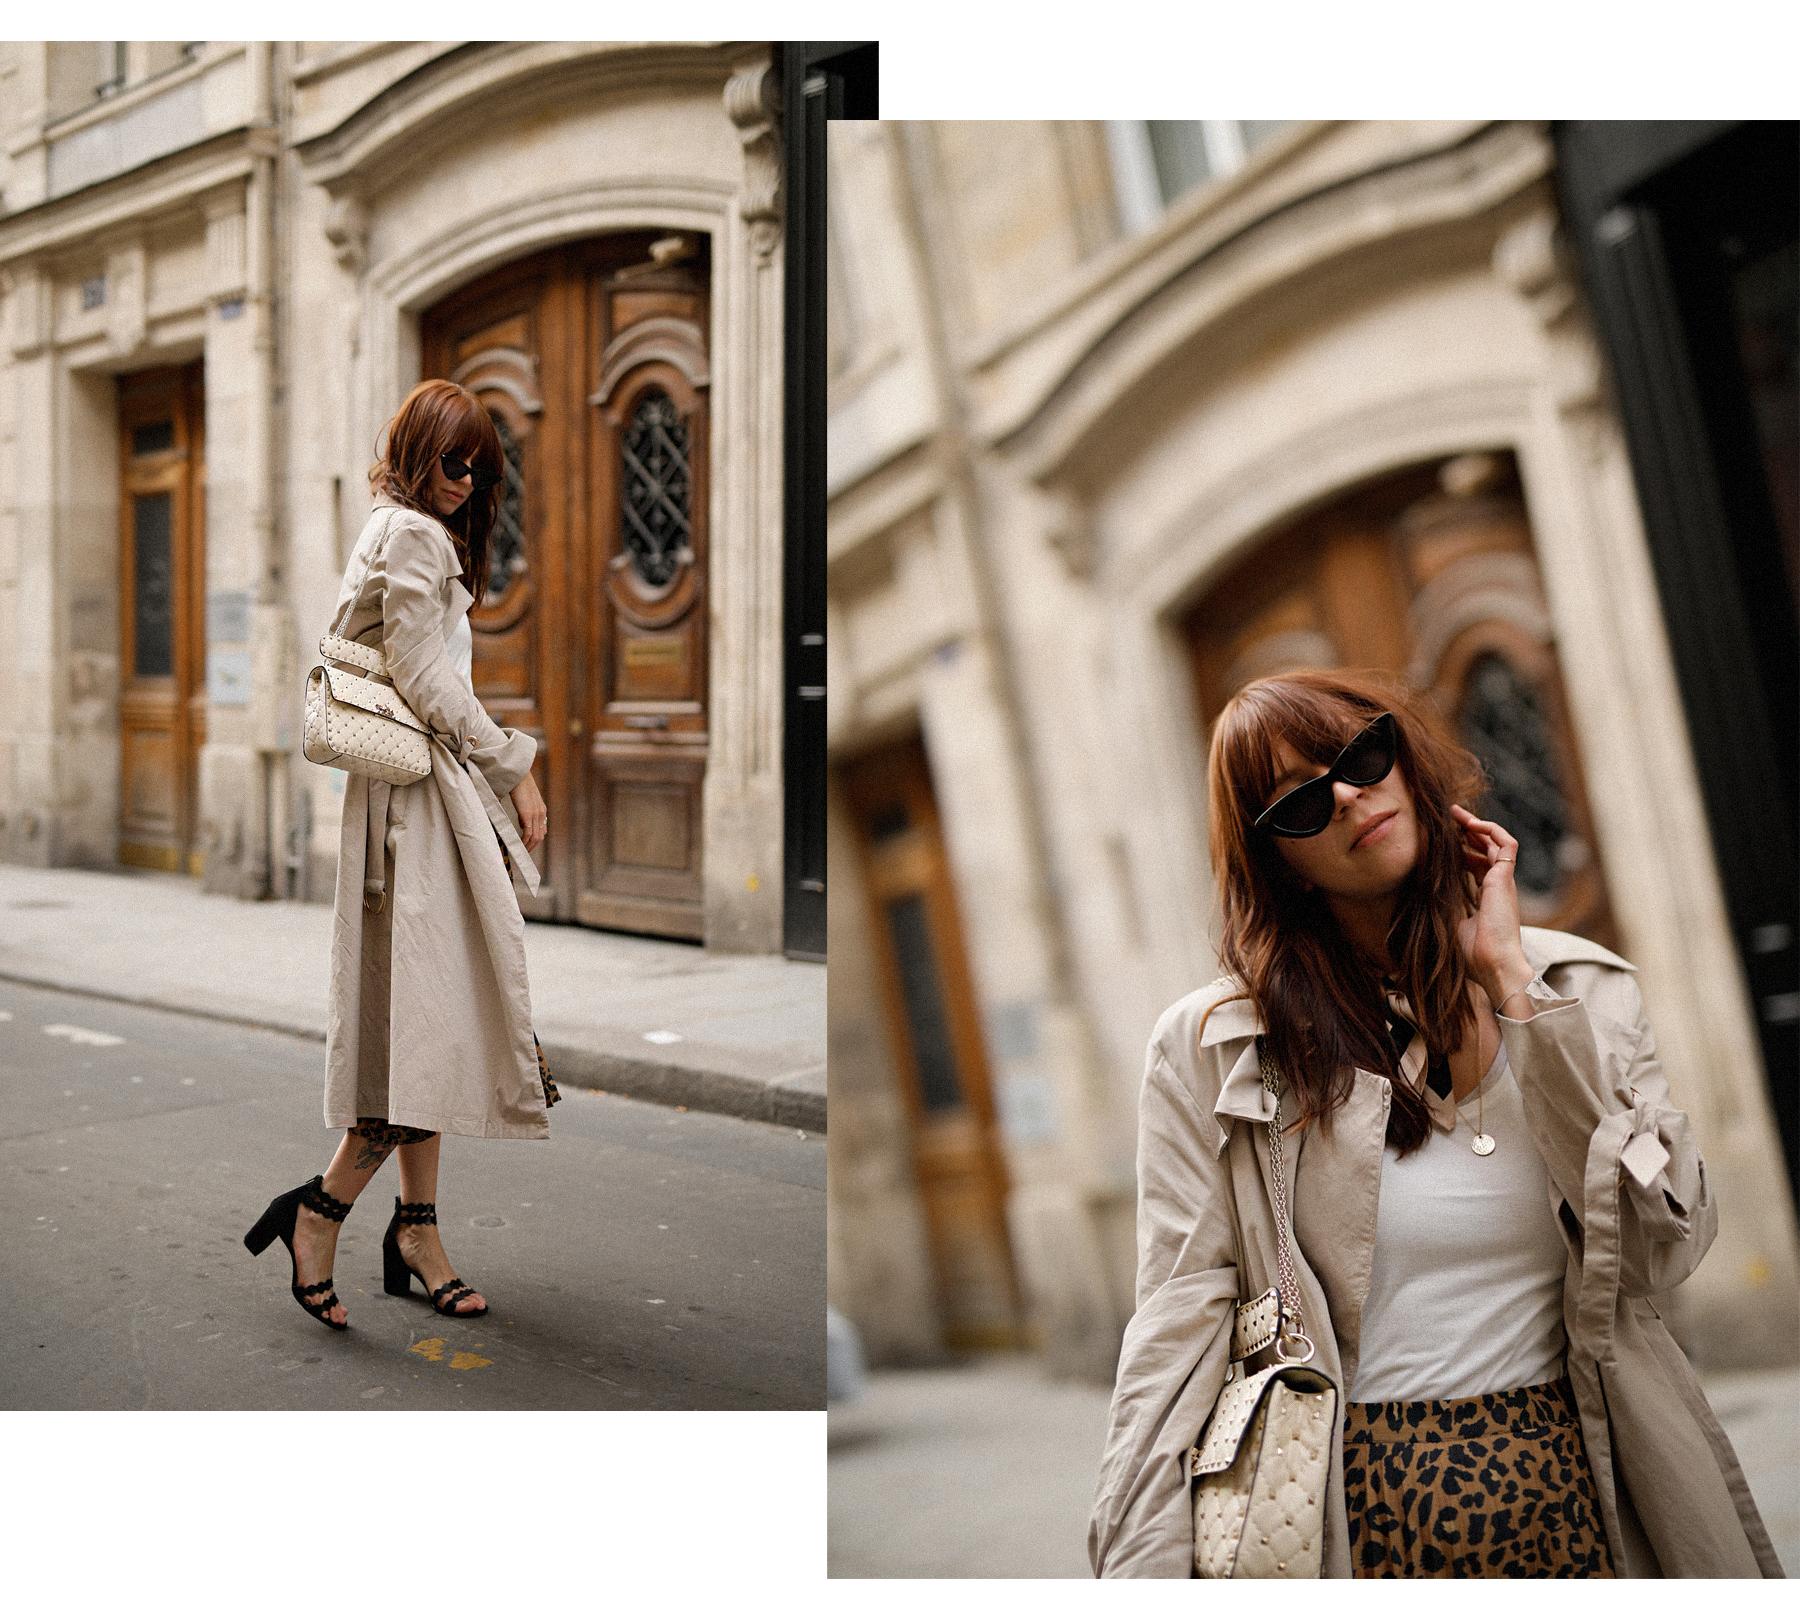 paris love mon amour mint&berry leopard print skirt trench coat valentino rockstud breuninger catsanddogsblog modeblogger styleblog modeblog outfitblog parisienne styliste cats&dogs max bechmann fotografie film düsseldorf 5